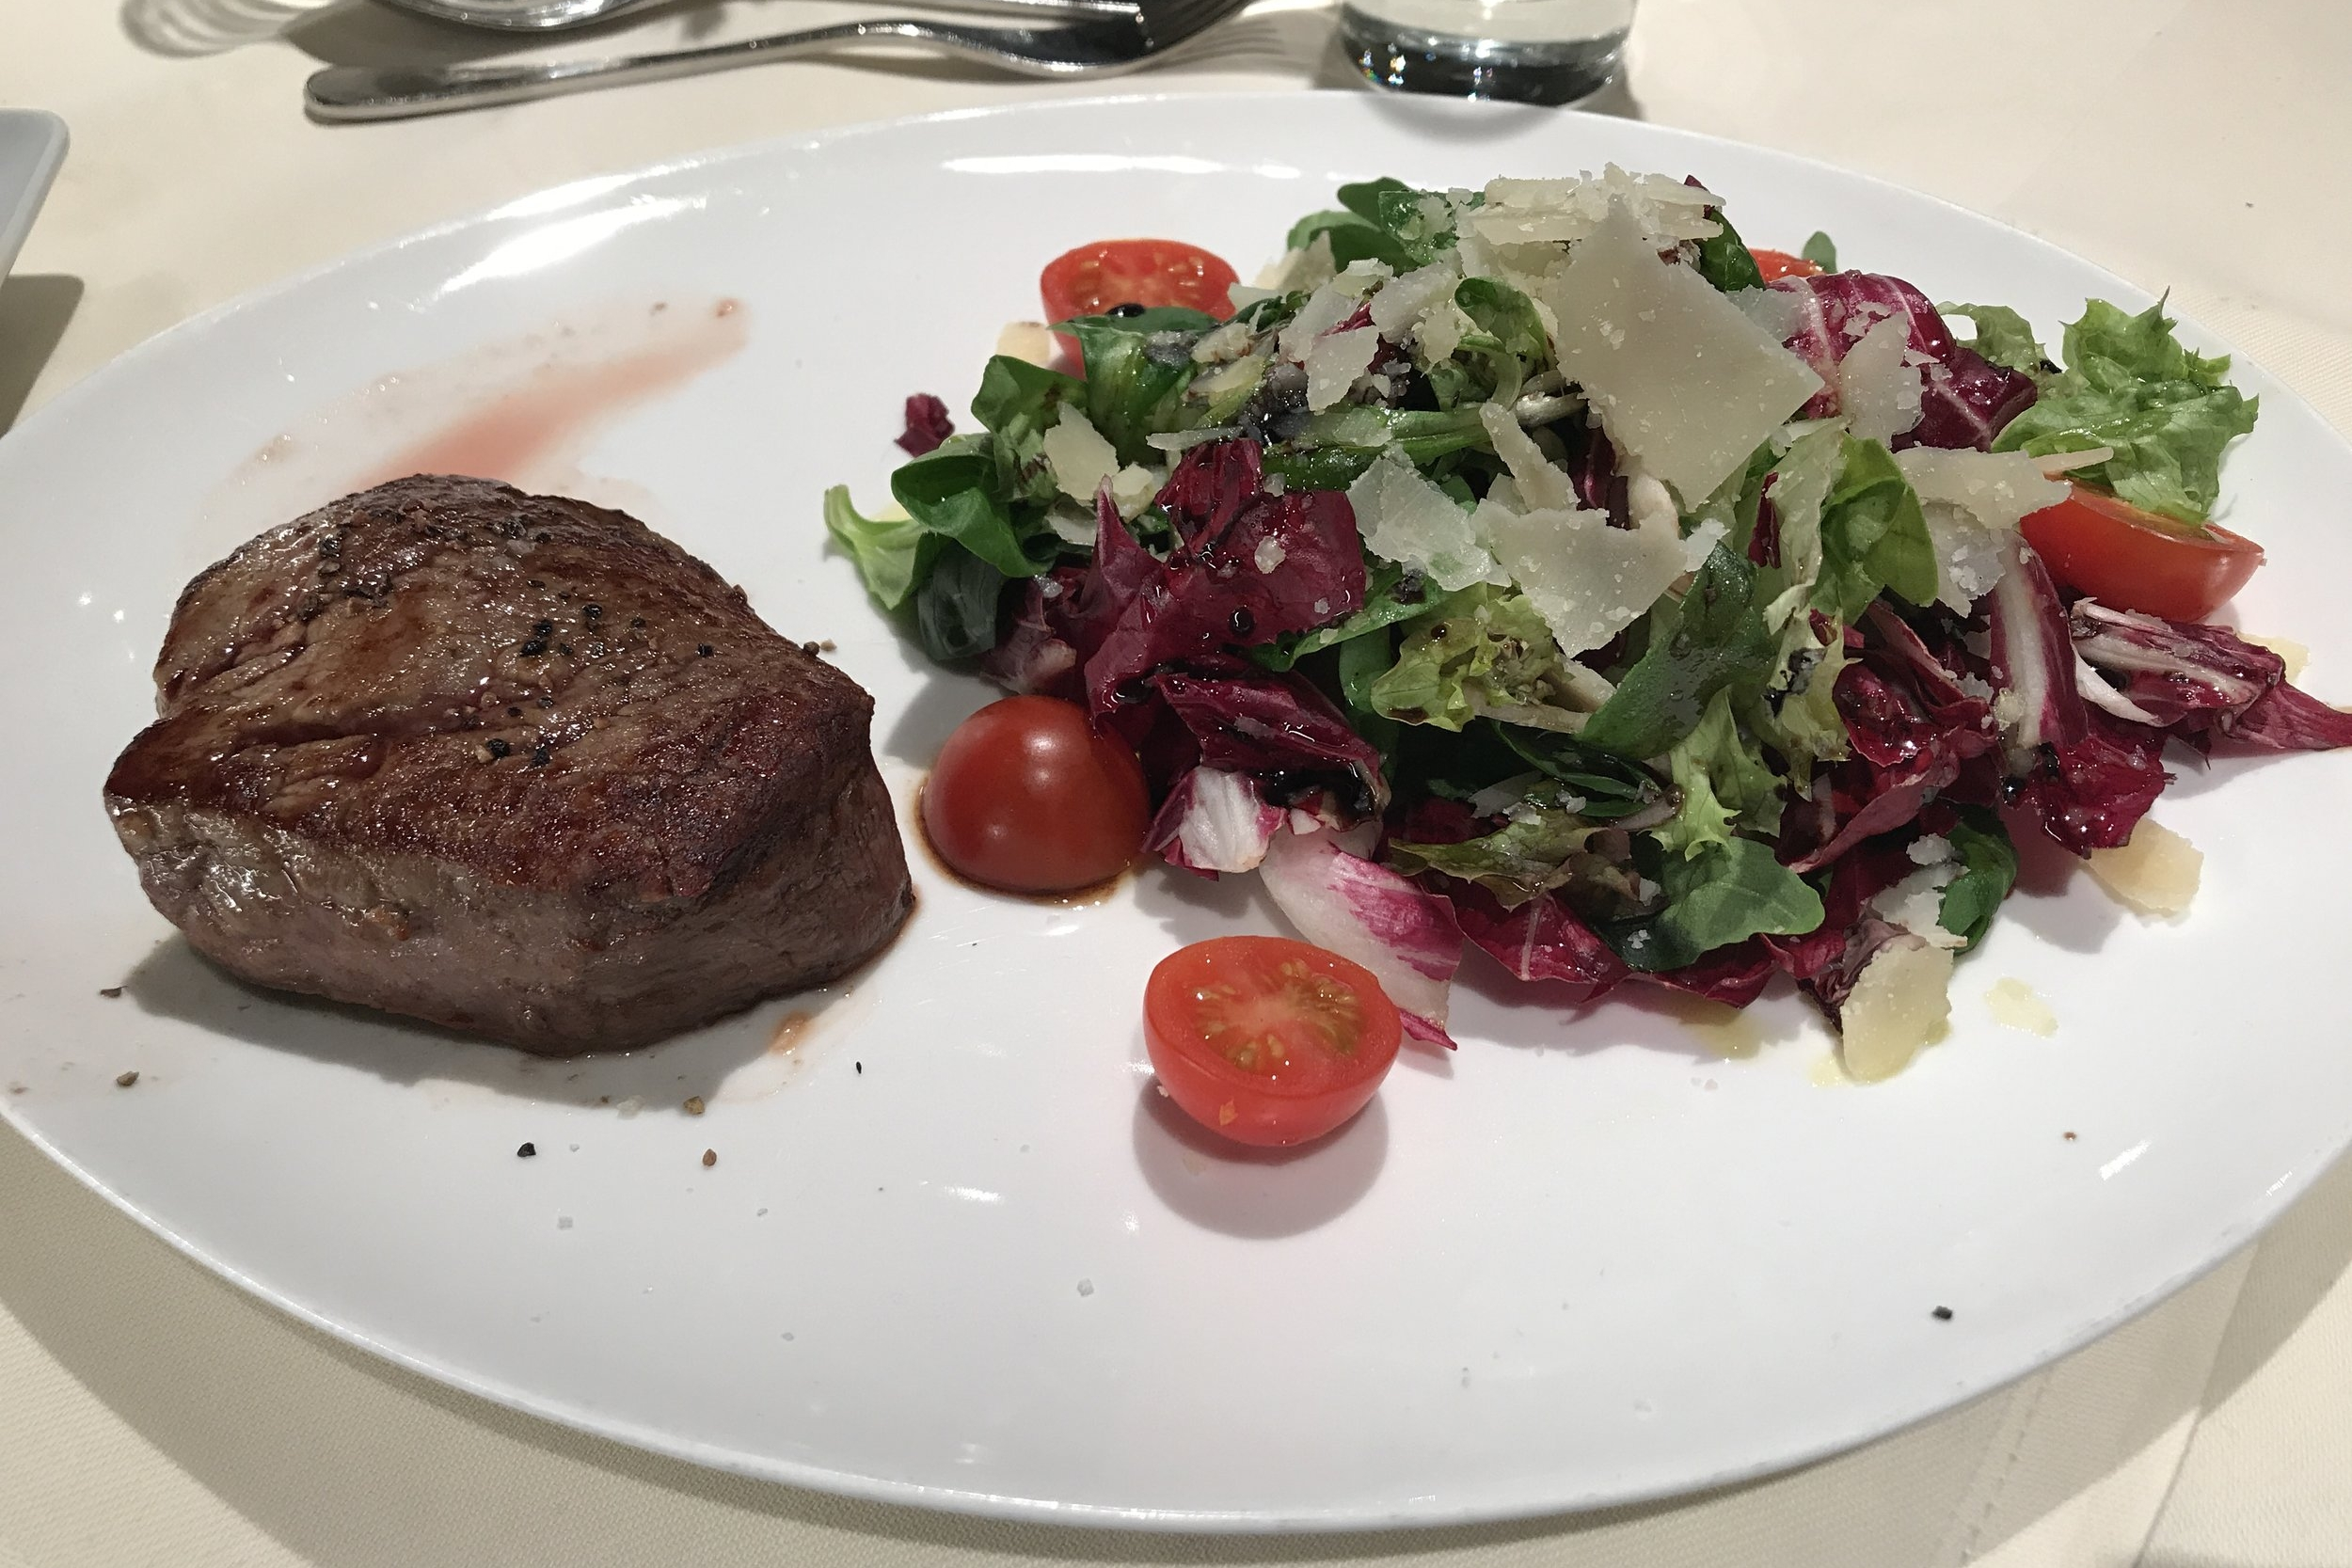 Lufthansa First Class Terminal Frankfurt – Steak with salad